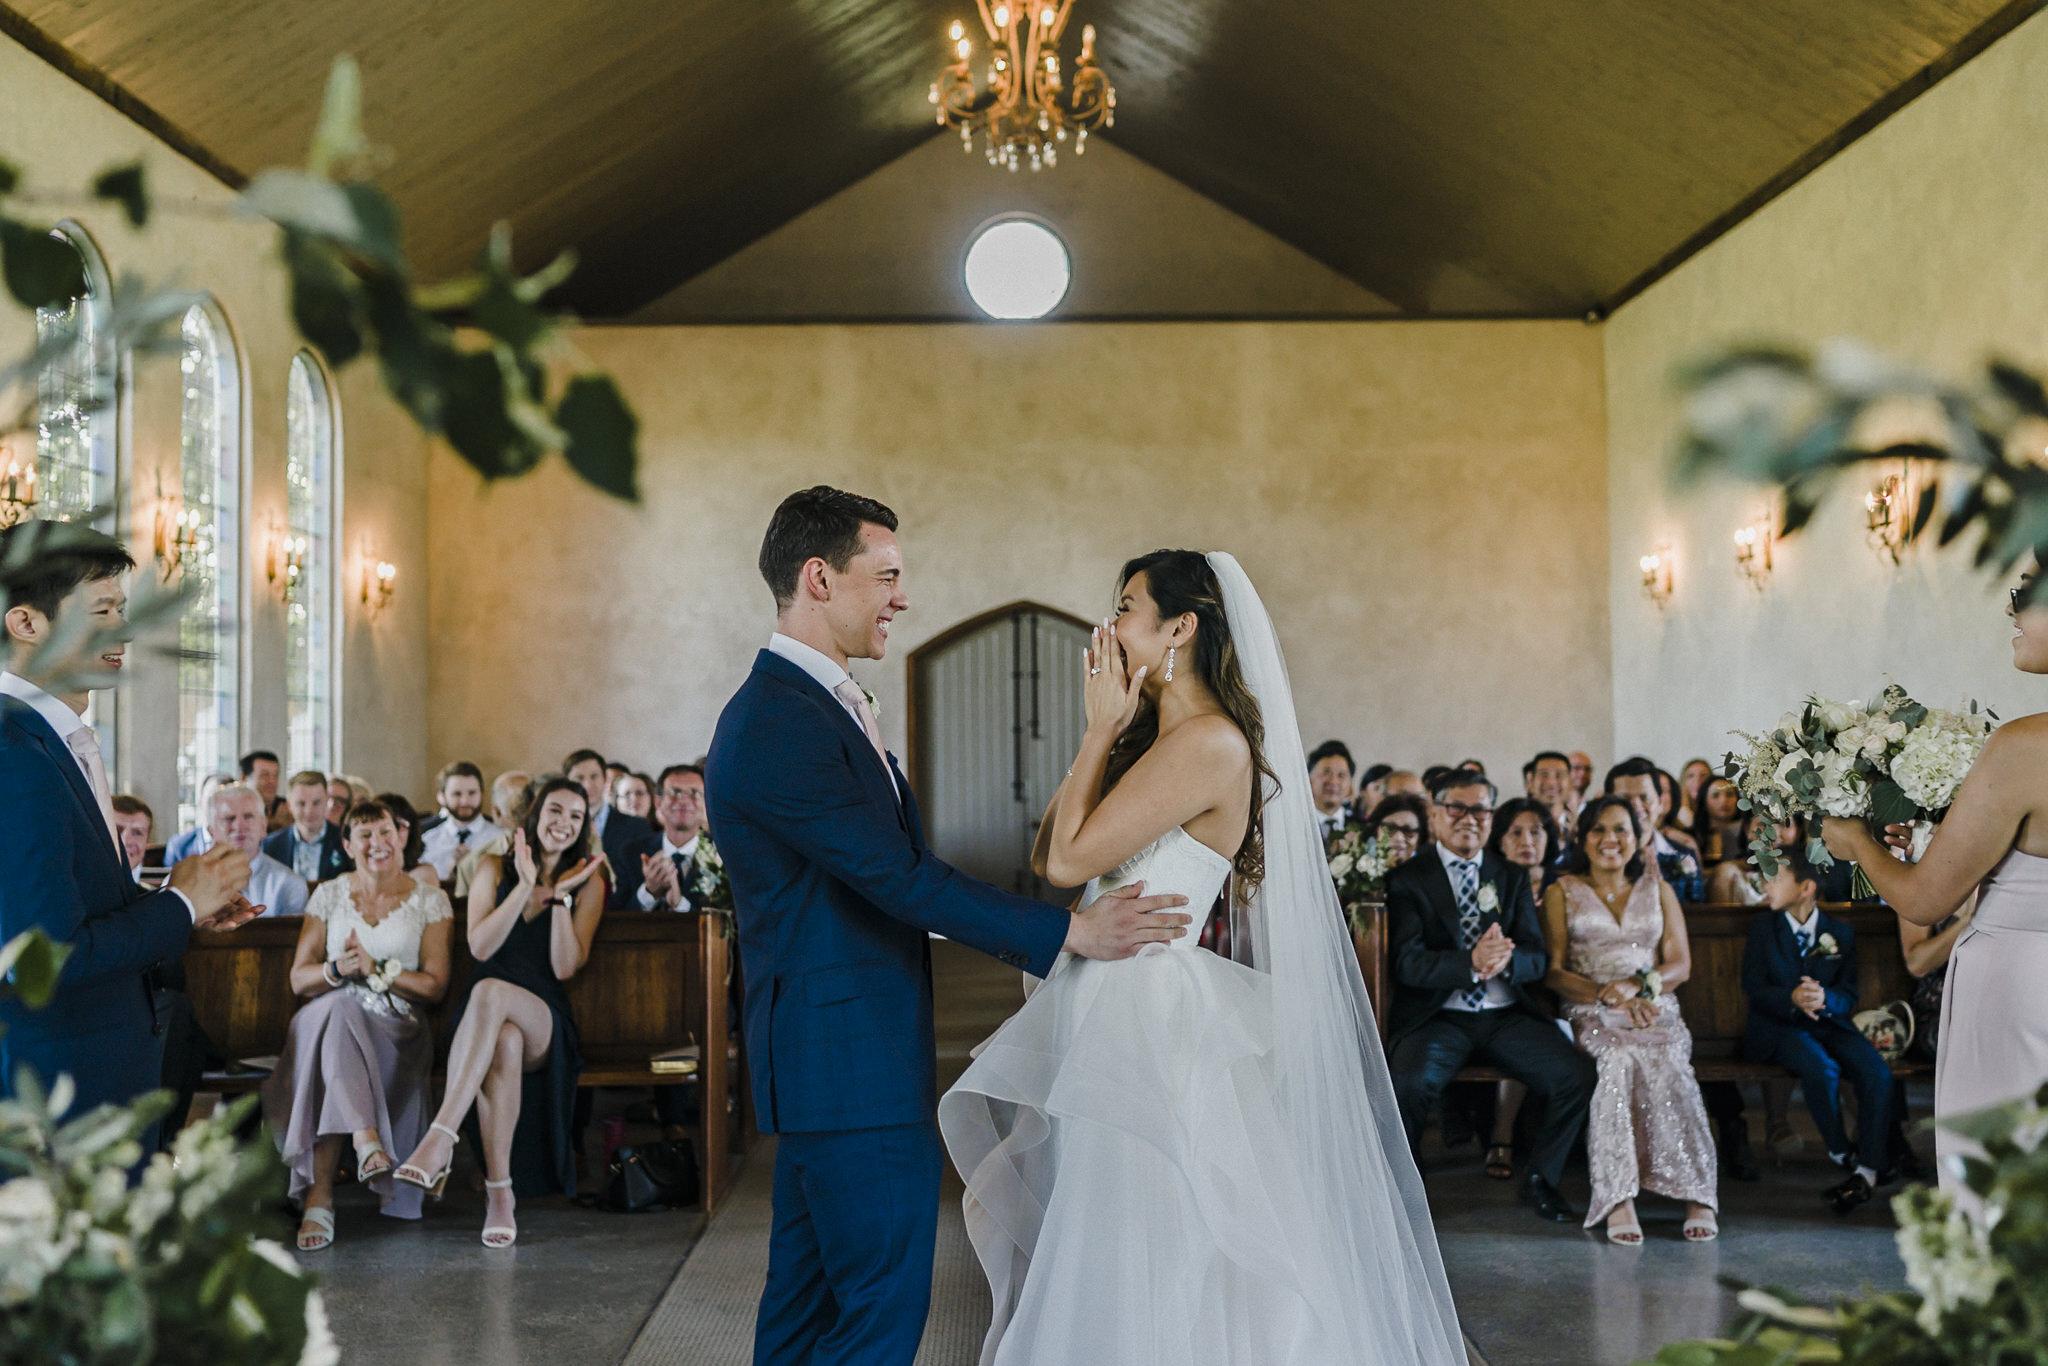 Corey Wright Stones Yarra Valley Wedding Photography_007